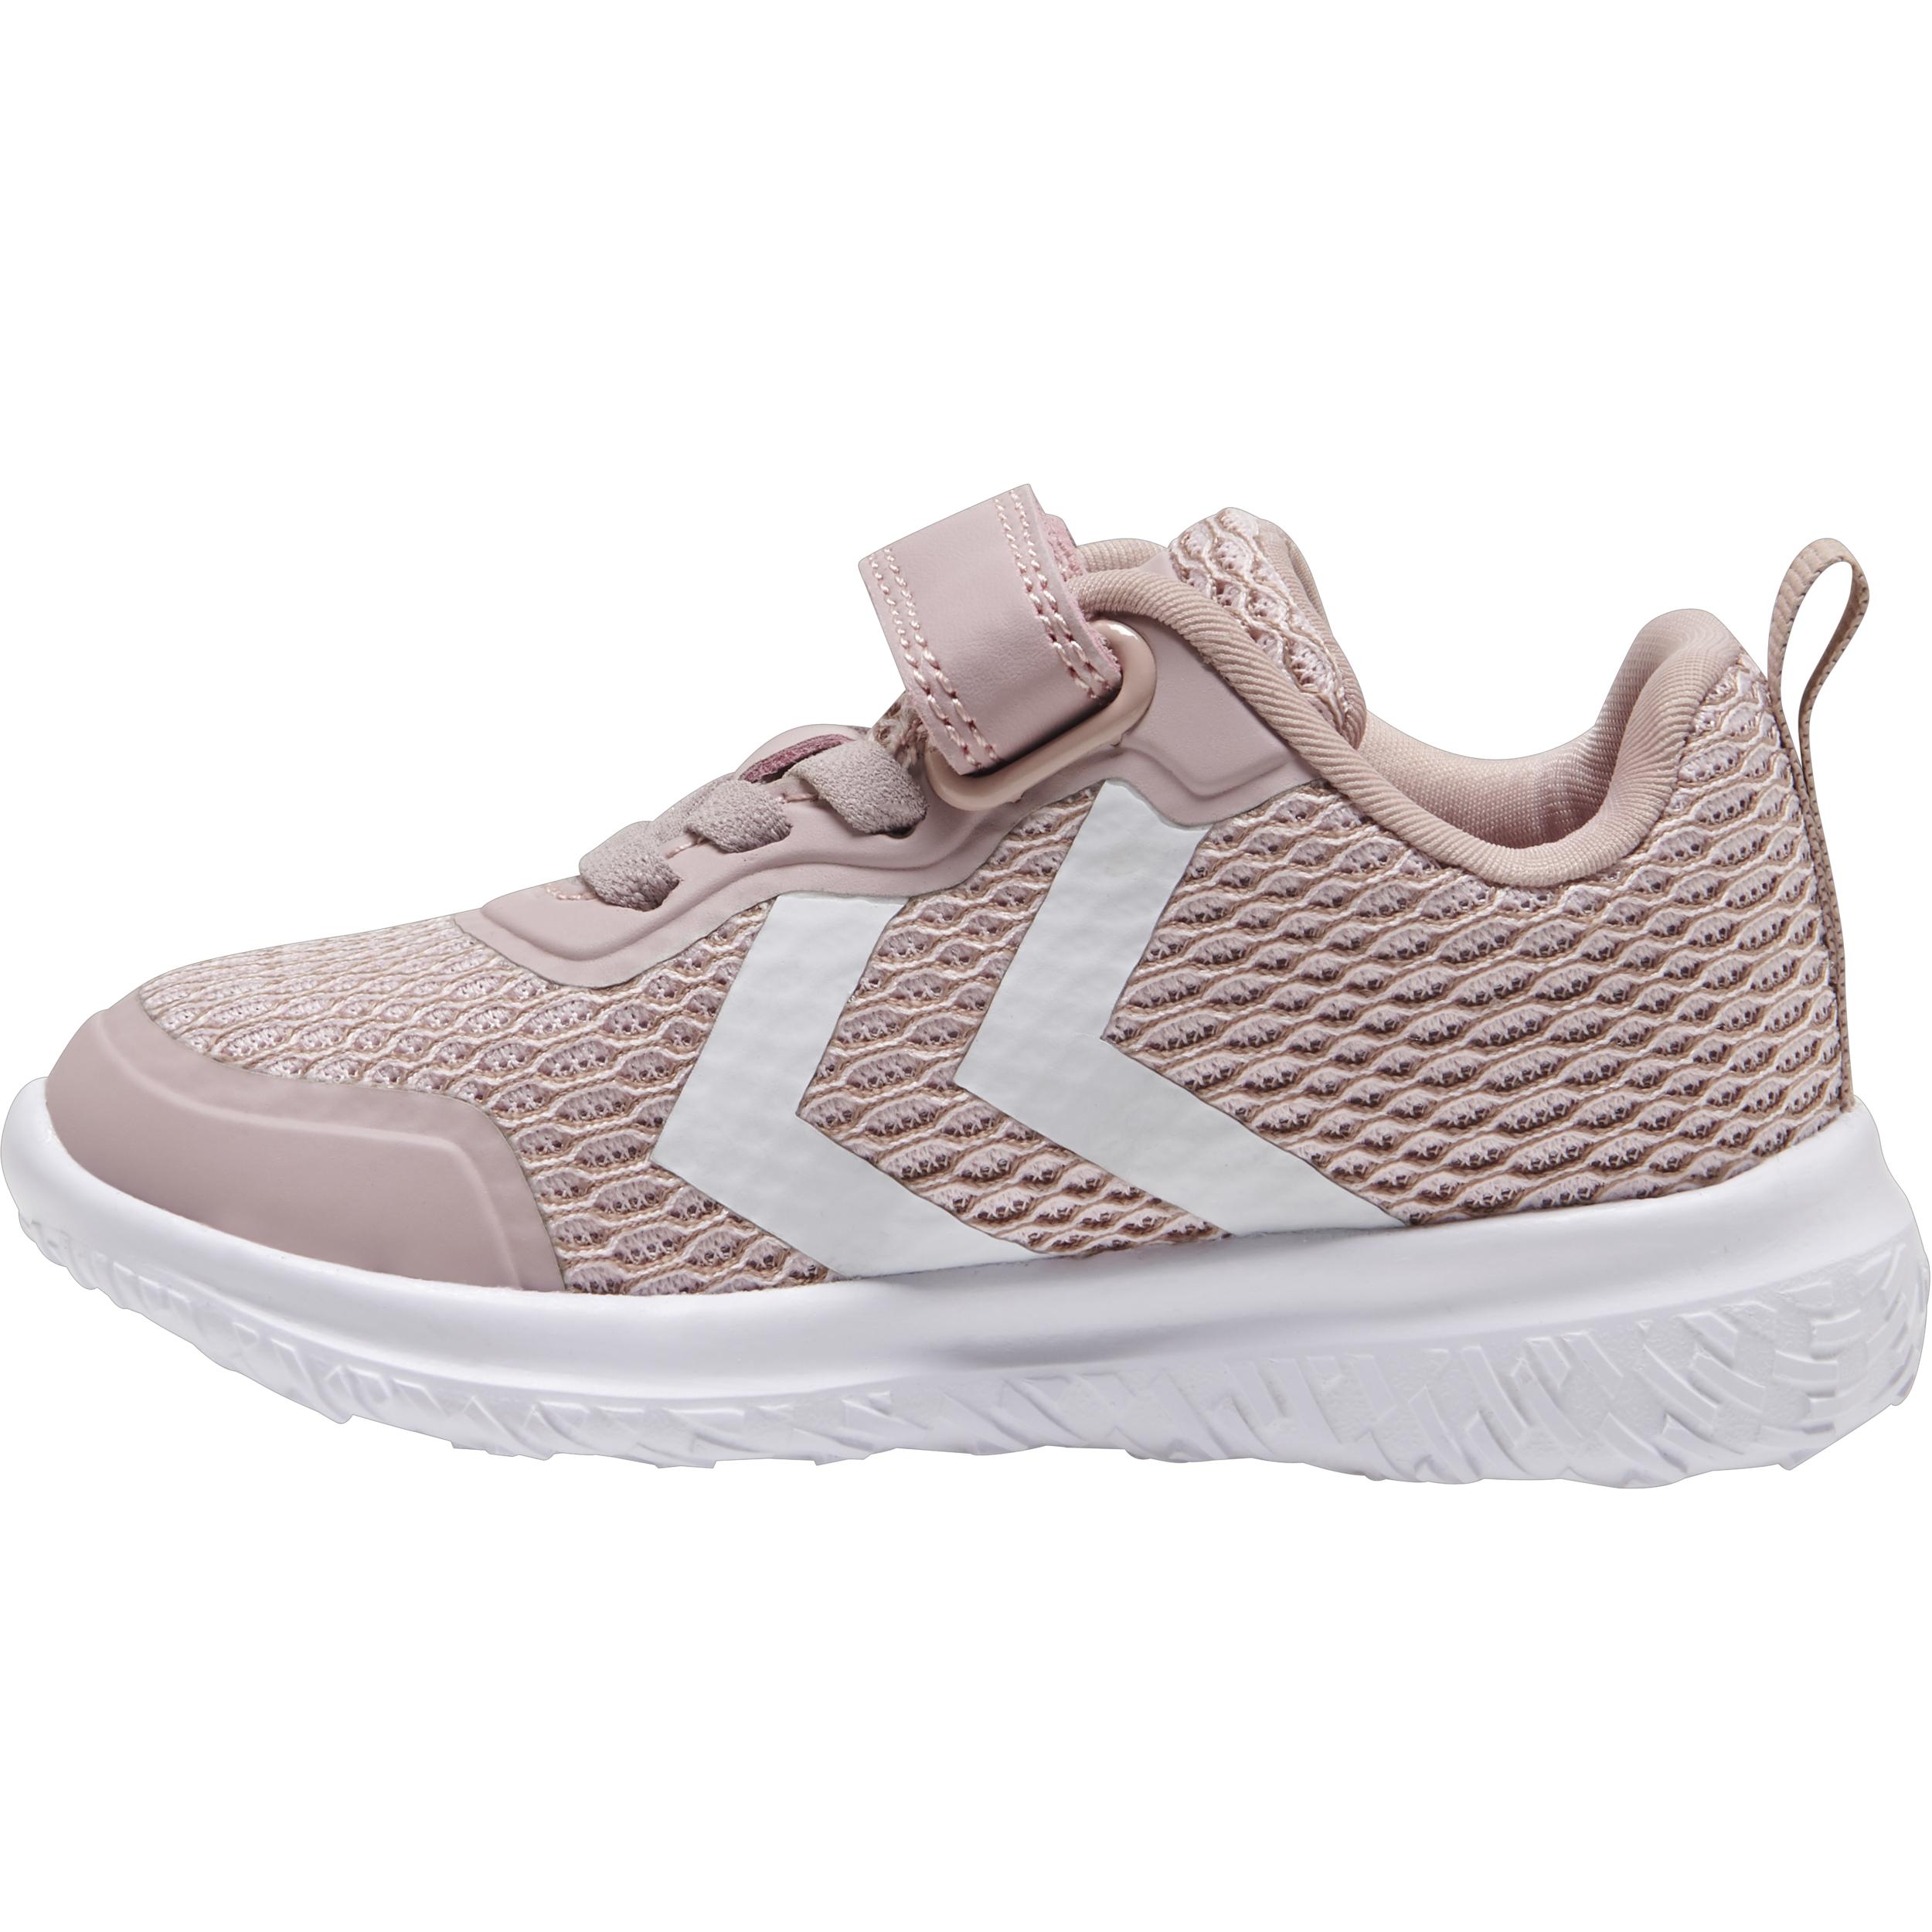 Hummel Actus Ml Infant sneakers, pale lilac, 20